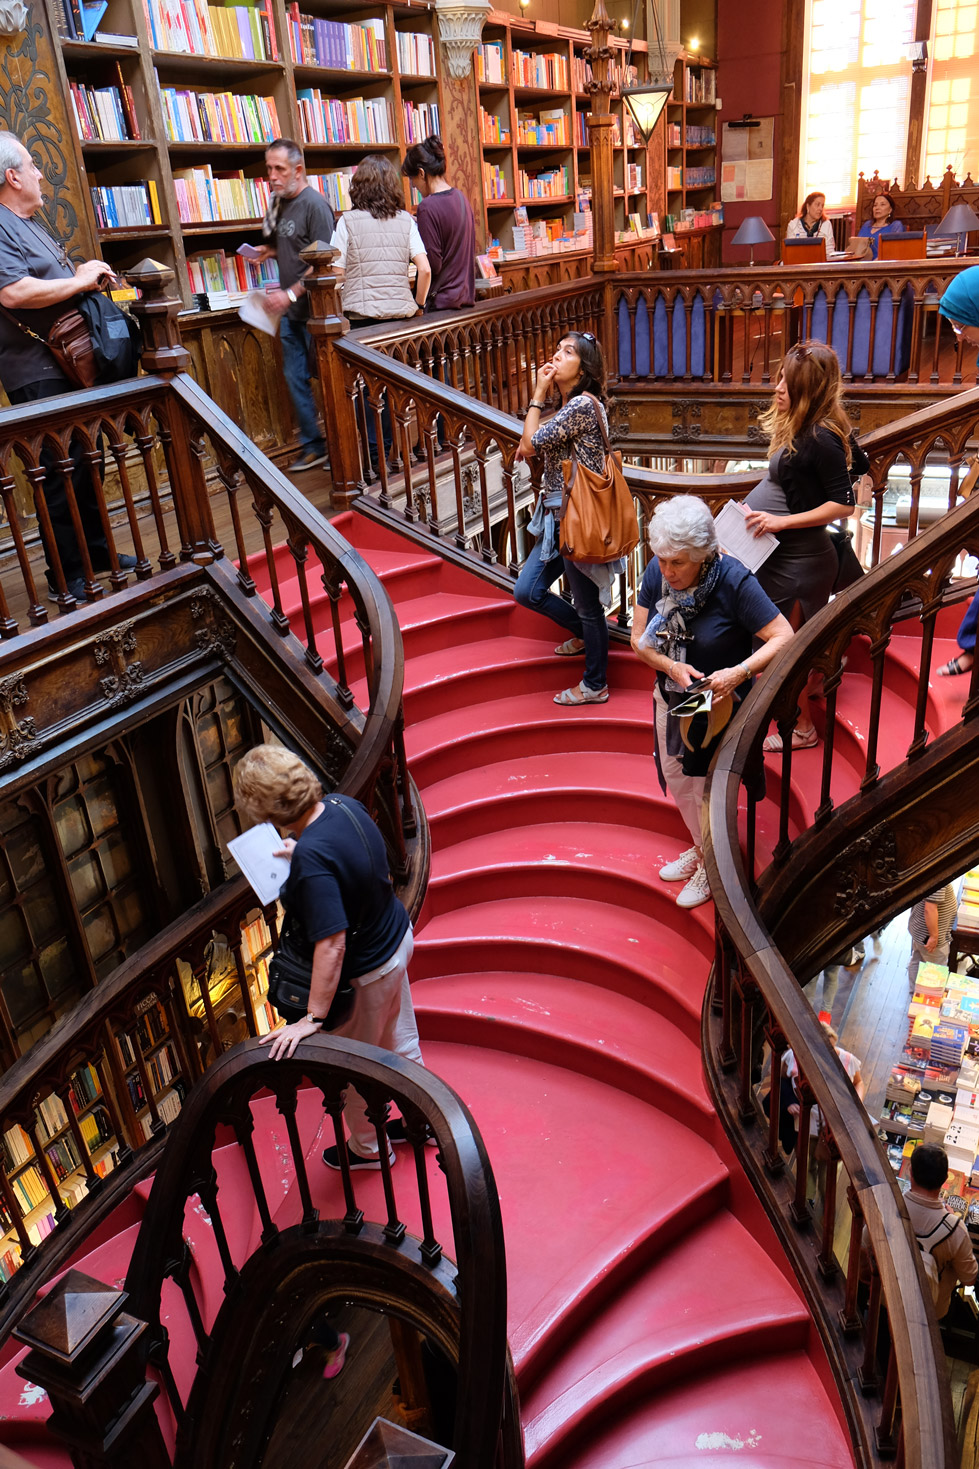 The lovely Livraria Lello bookshop in Porto